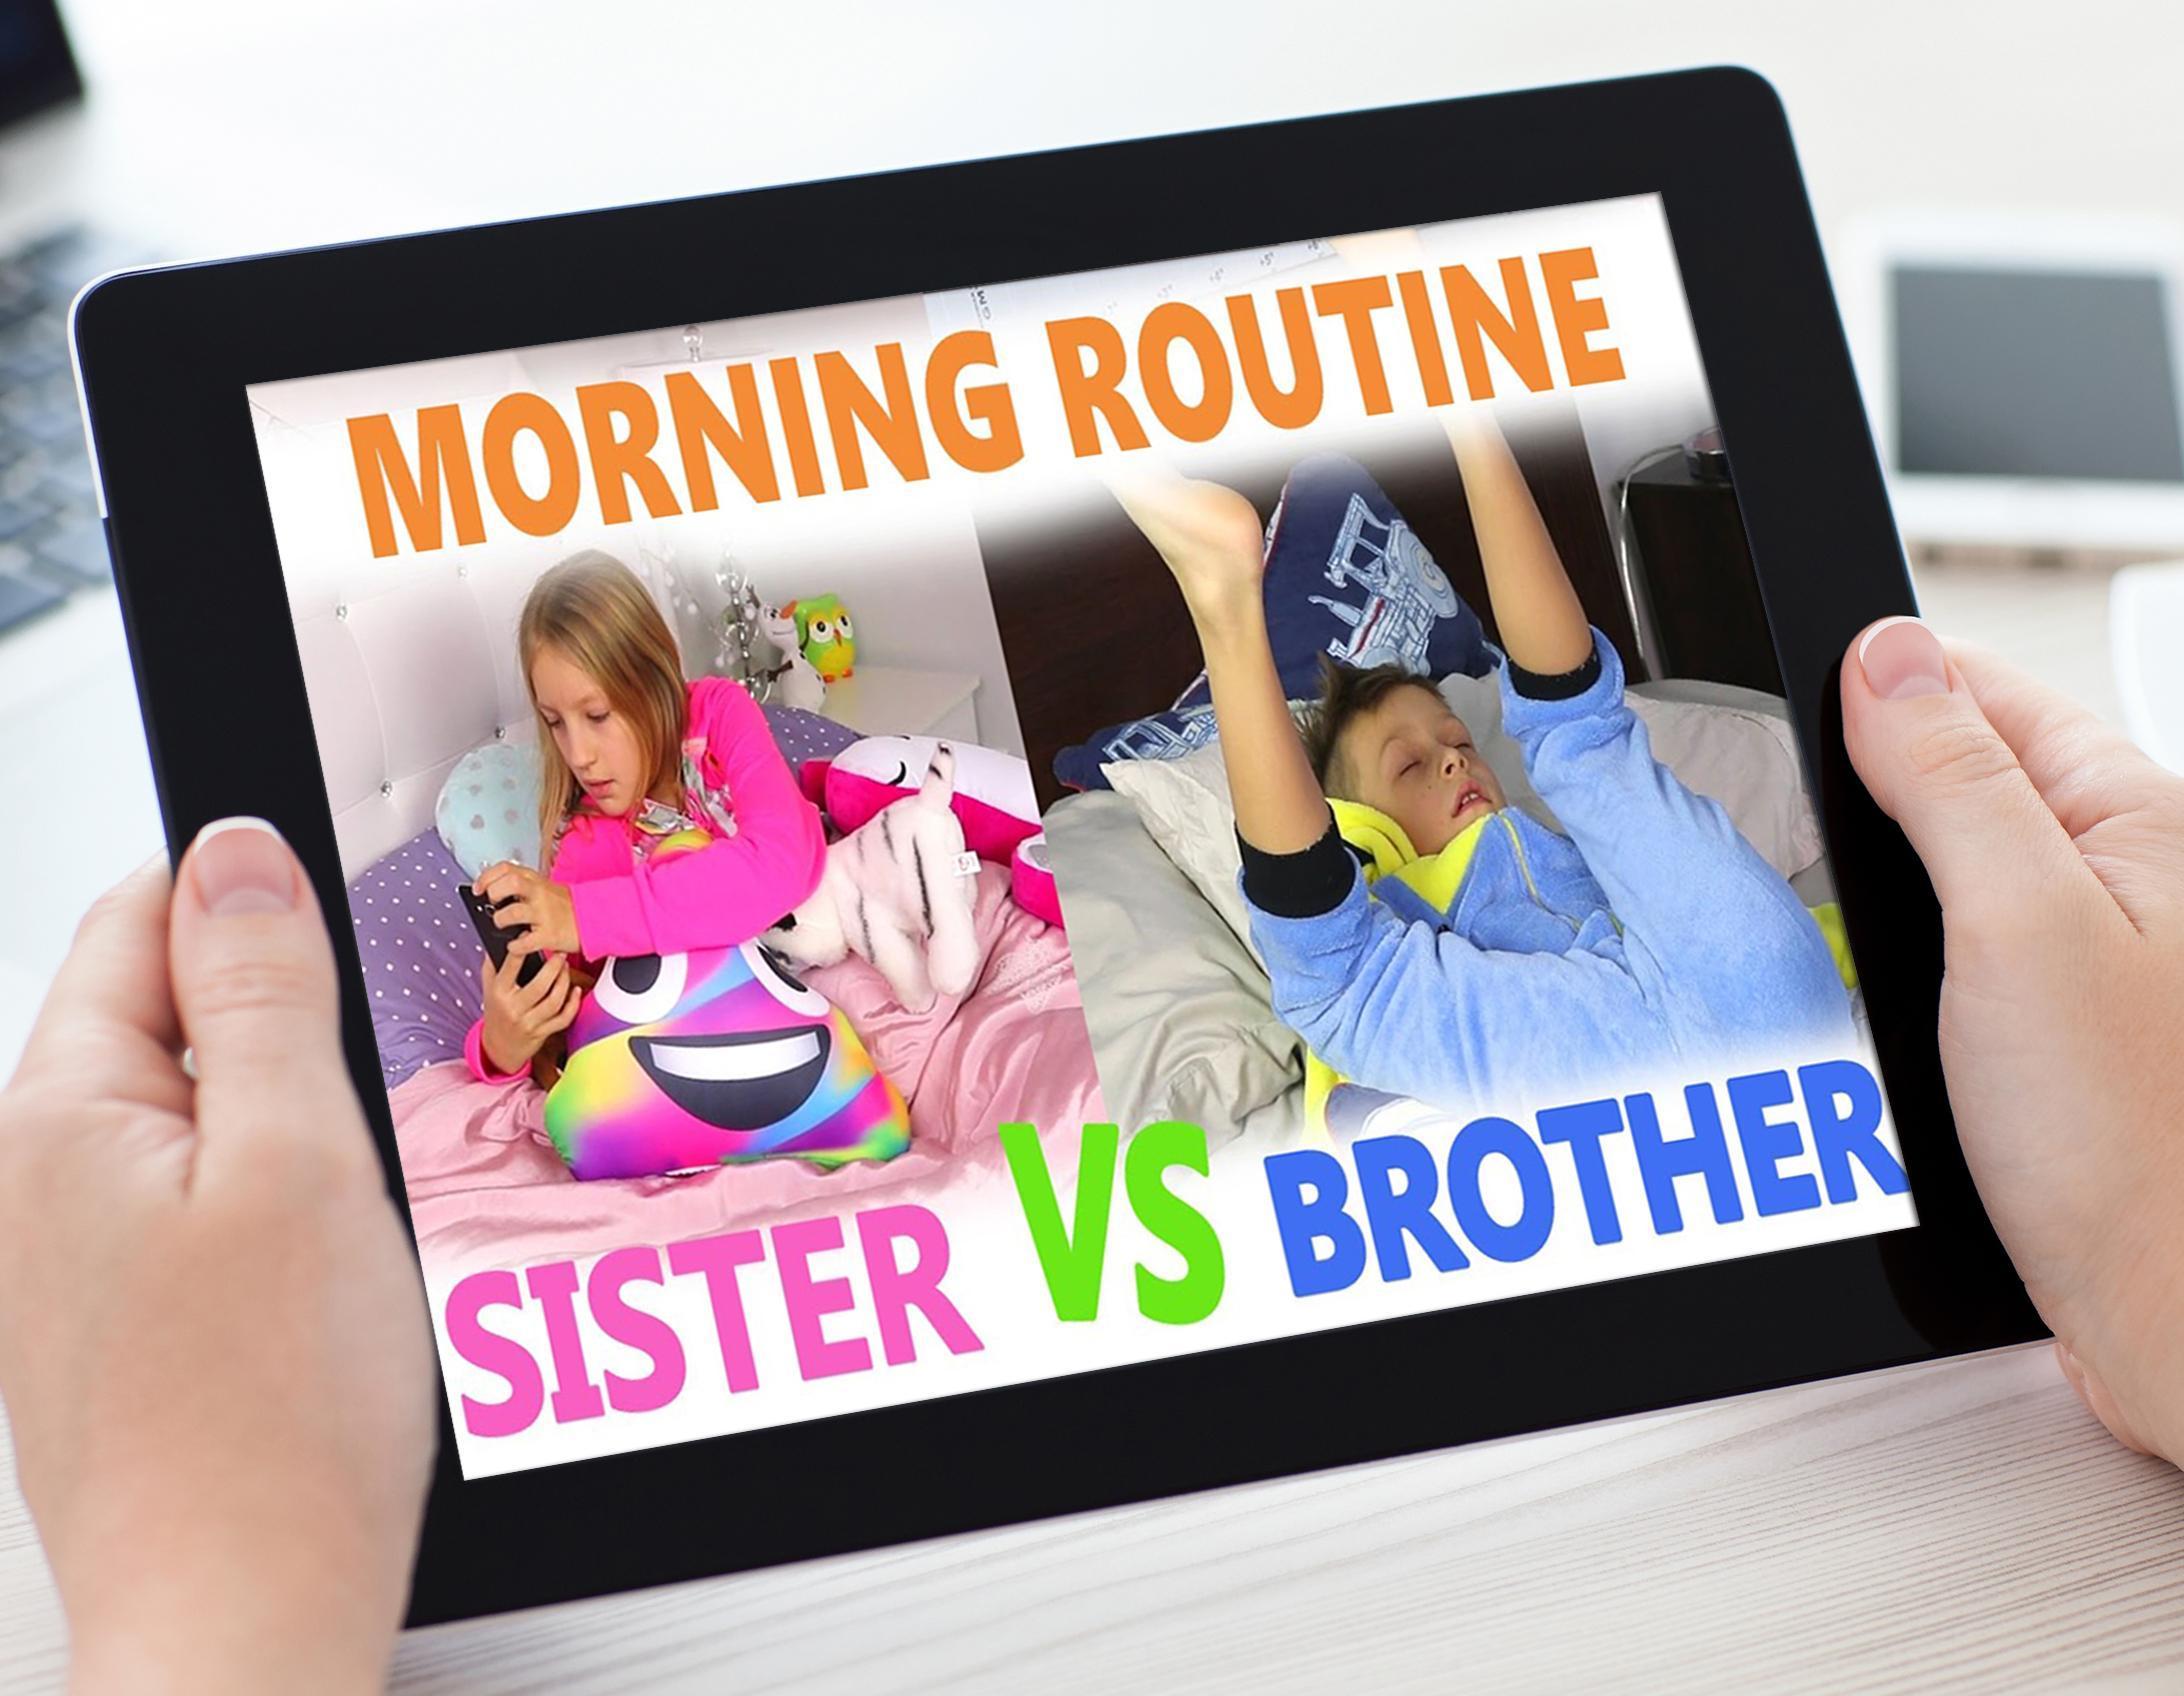 sis vs bro routines